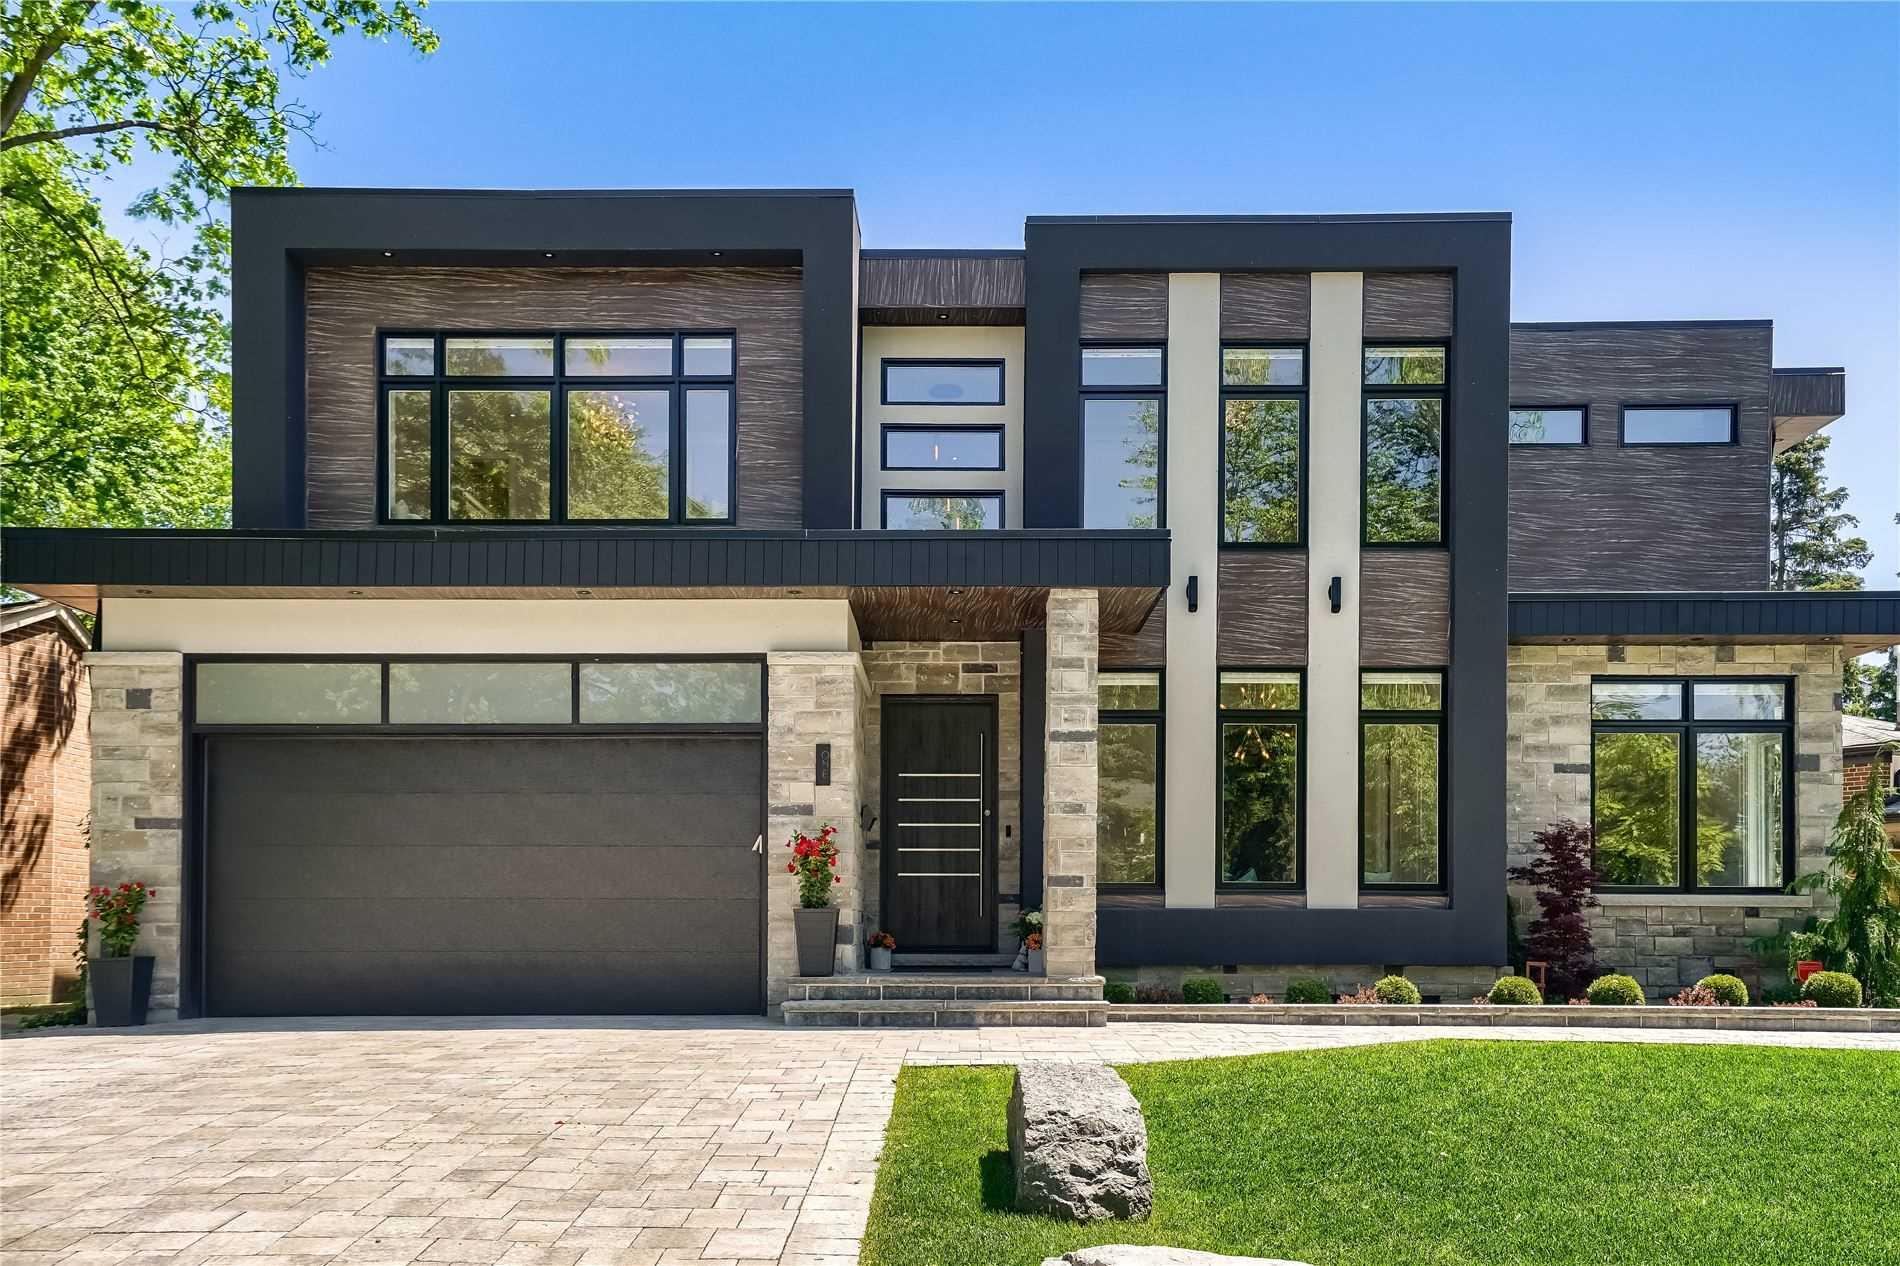 1 George Henry Blvd, Toronto, Ontario M2J1E1, 4 Bedrooms Bedrooms, 11 Rooms Rooms,6 BathroomsBathrooms,Detached,For Sale,George Henry,C5390551